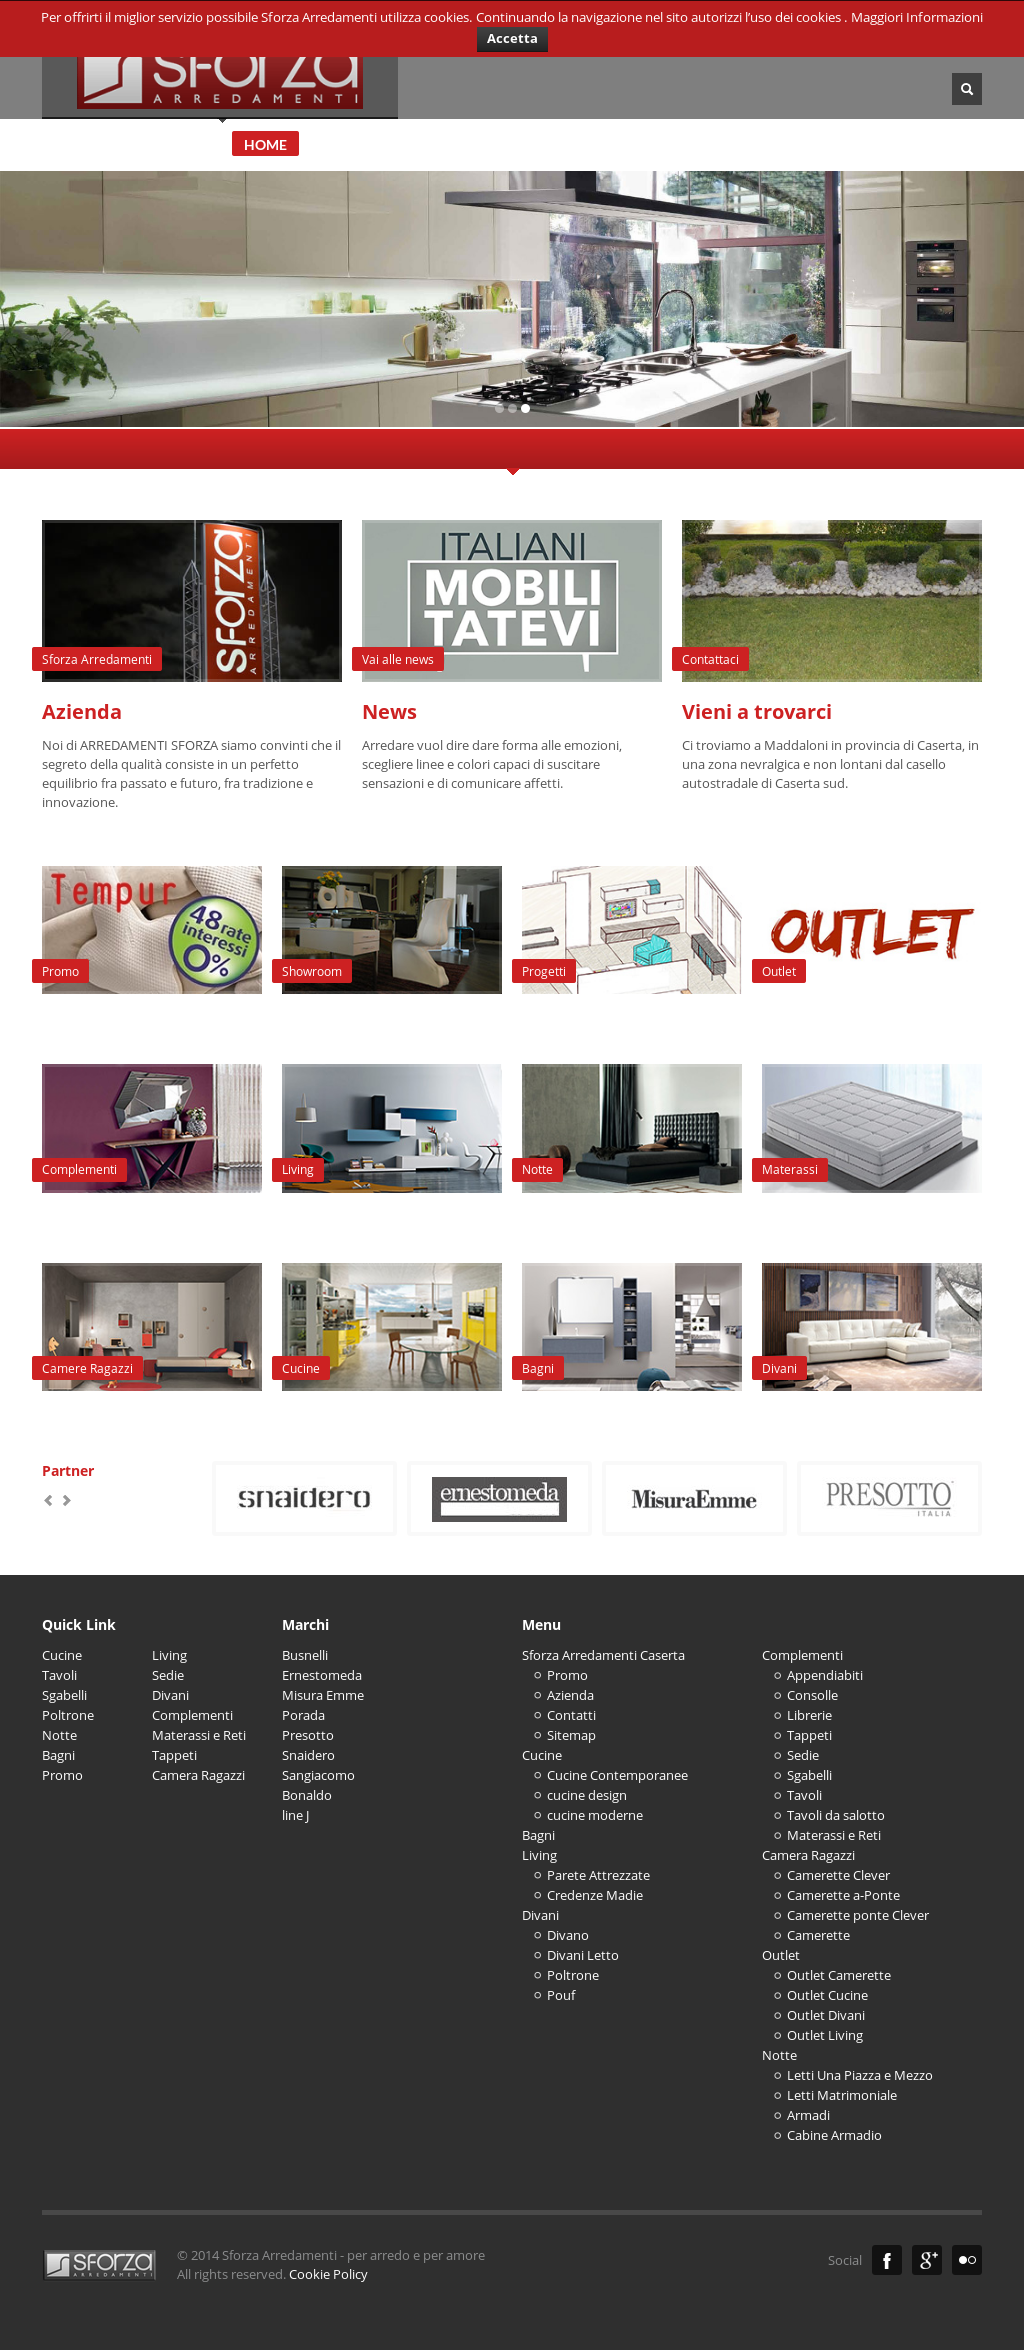 Outlet Armadi On Line. Top Divani Design Outlet Meglio Di Armadi ...